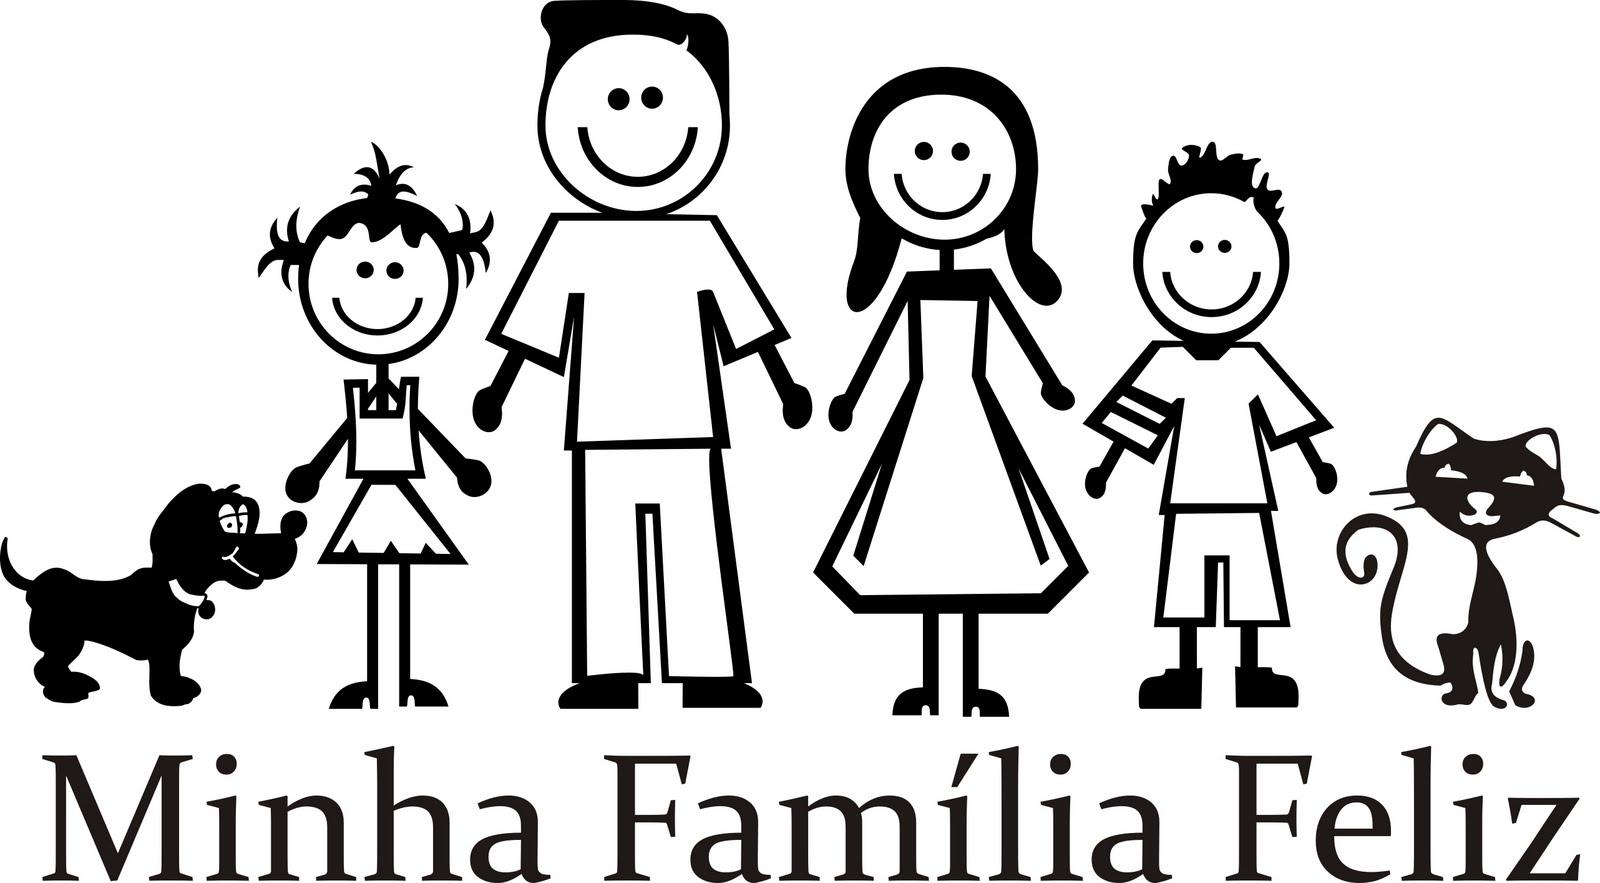 Dibujos De Familia Para Colorear E Imprimir: Dibujos Para Colorear De Una Familia